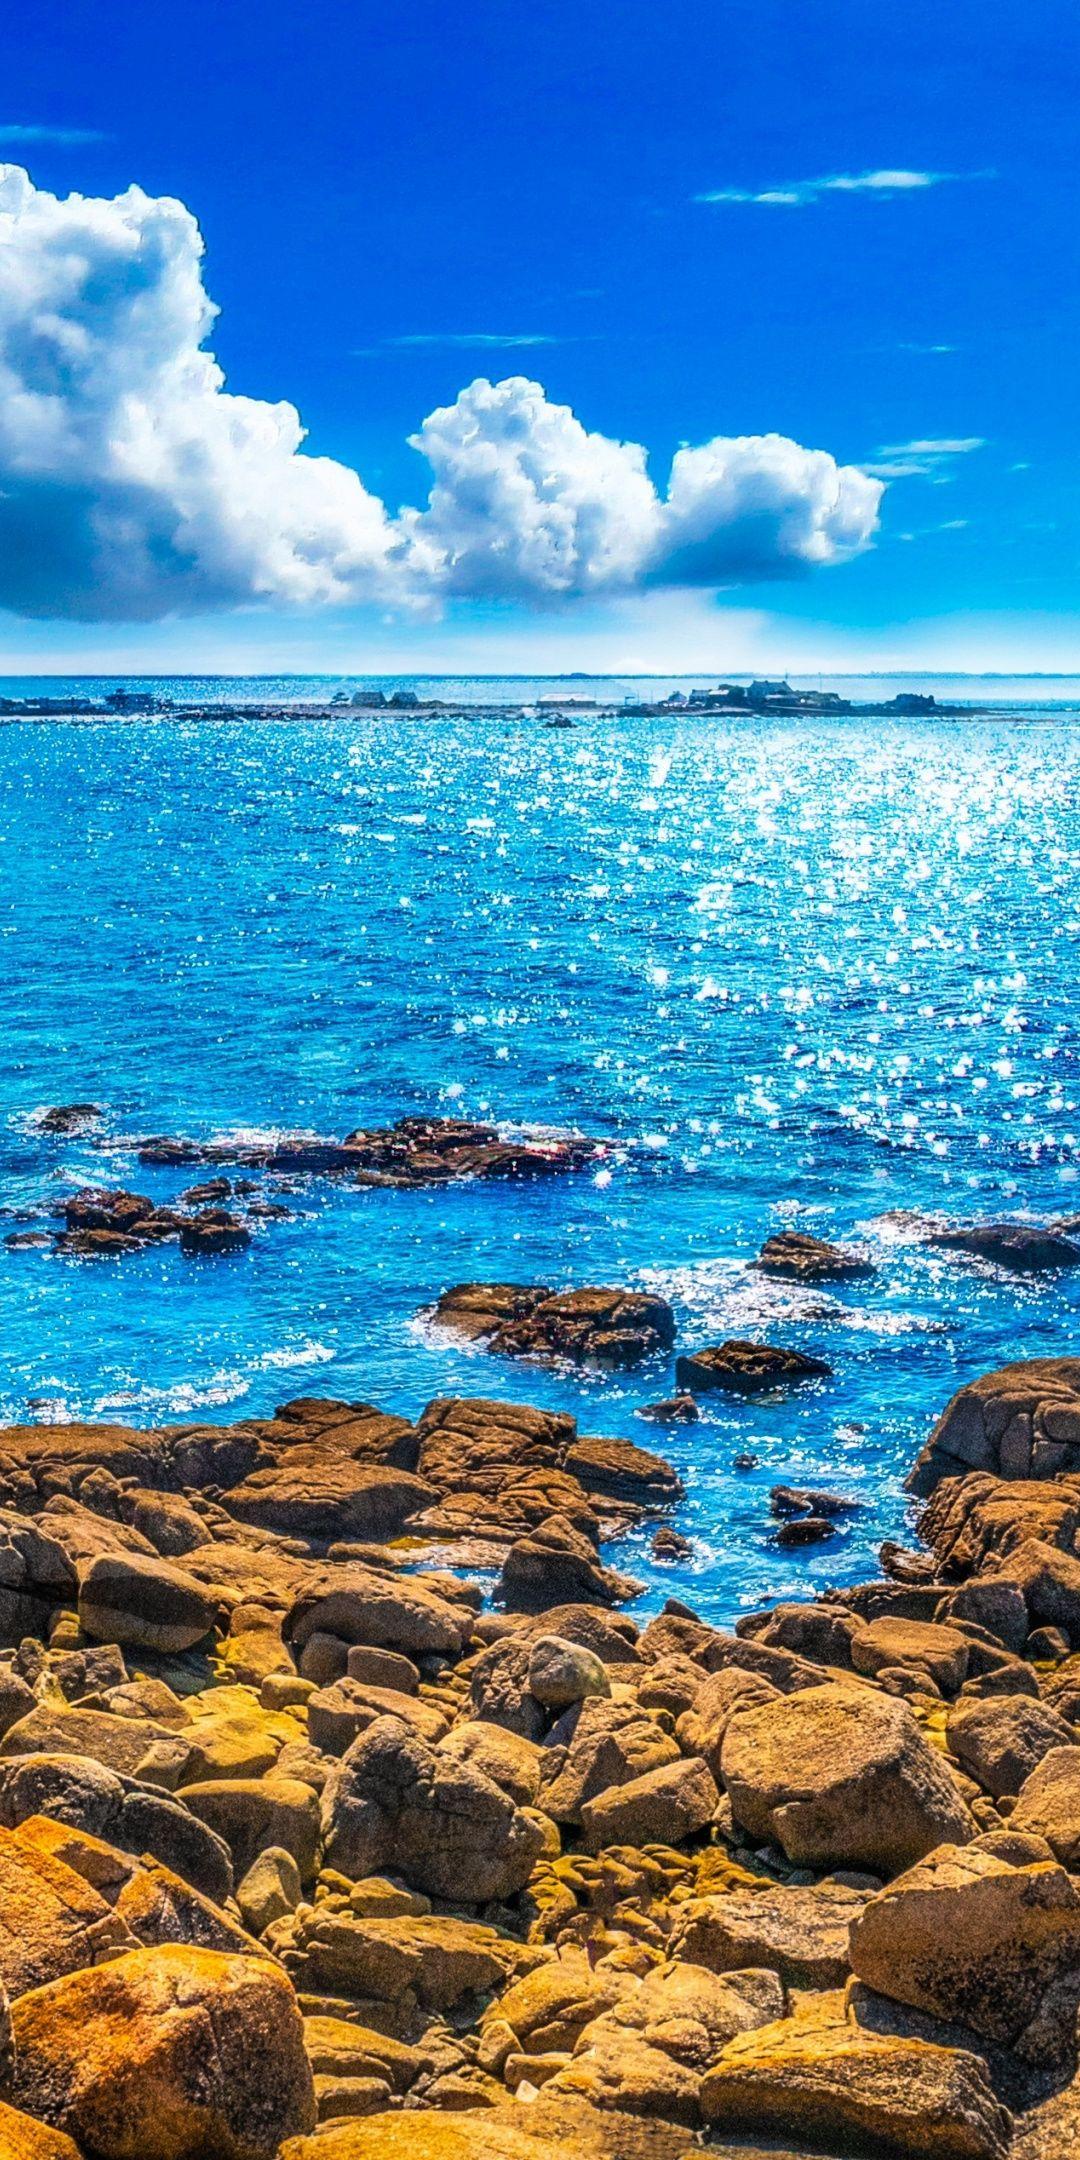 Rocks coast sunny day blue sea 1080x2160 wallpaper Beautiful 1080x2160